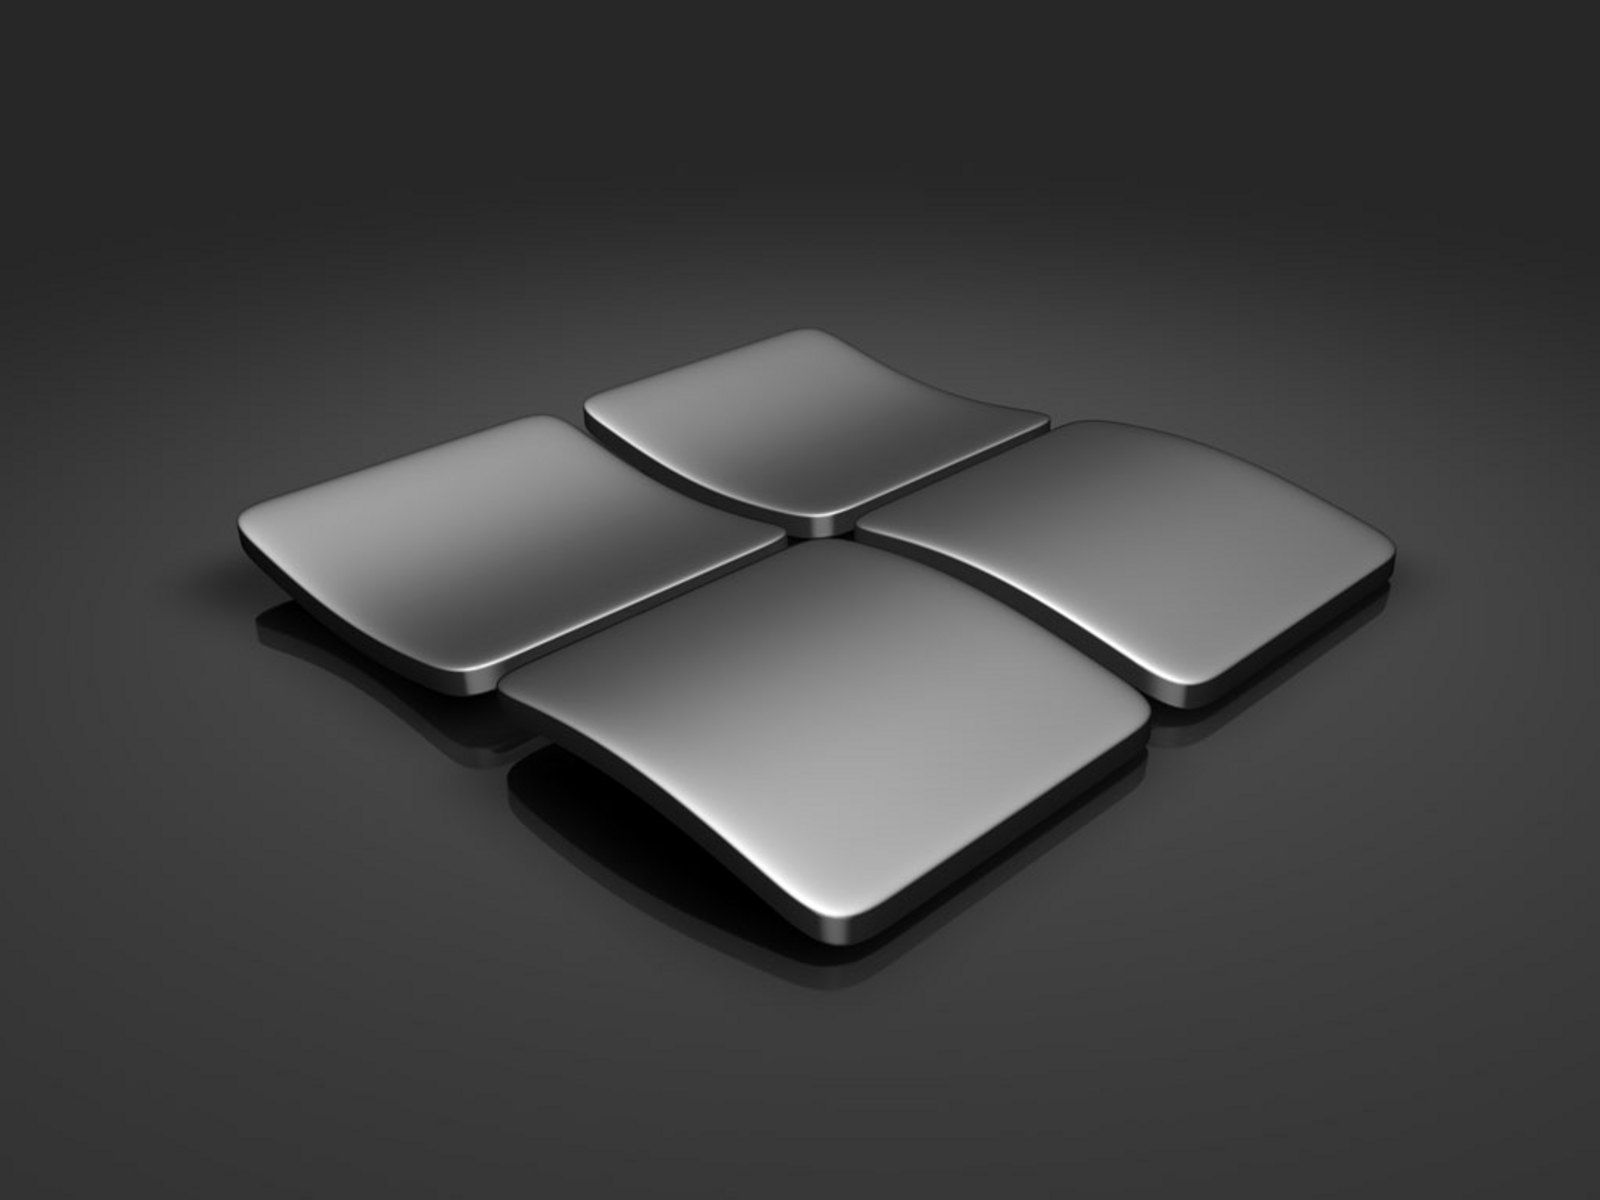 Windows 10 Desktop Is Black 15 Hd Wallpaper And Full Hd Wallpapers High Quality Desktop Wallpapers Add O In 2020 Windows Wallpaper Dark Windows Wallpaper Windows 10